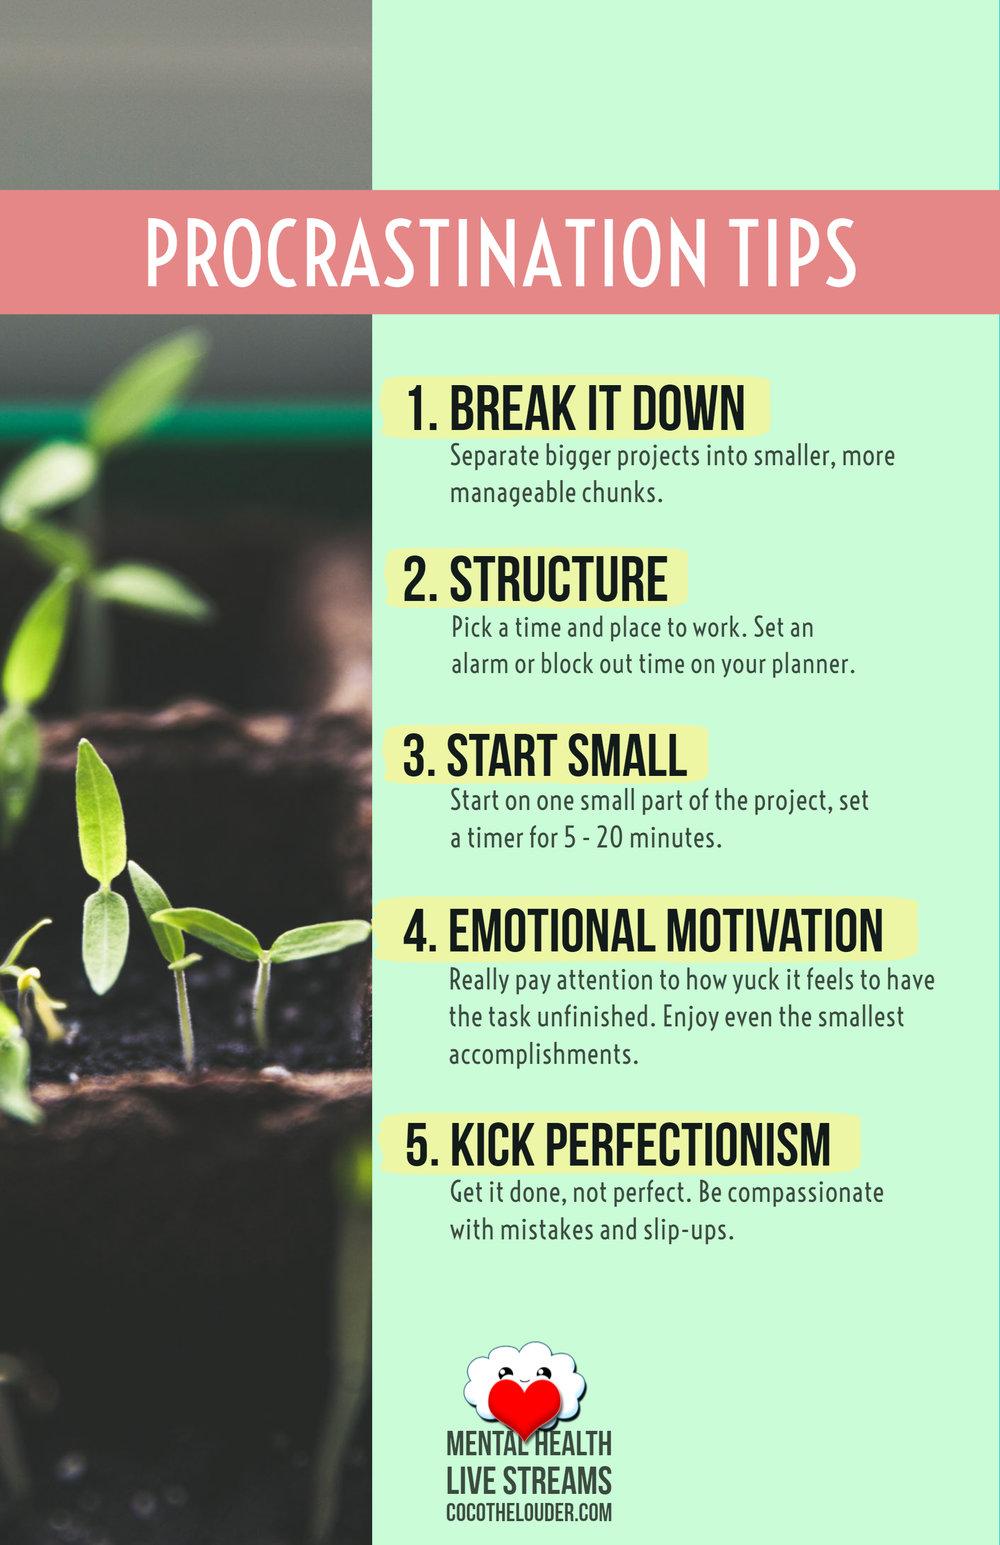 Procrastination Tips 2.jpg